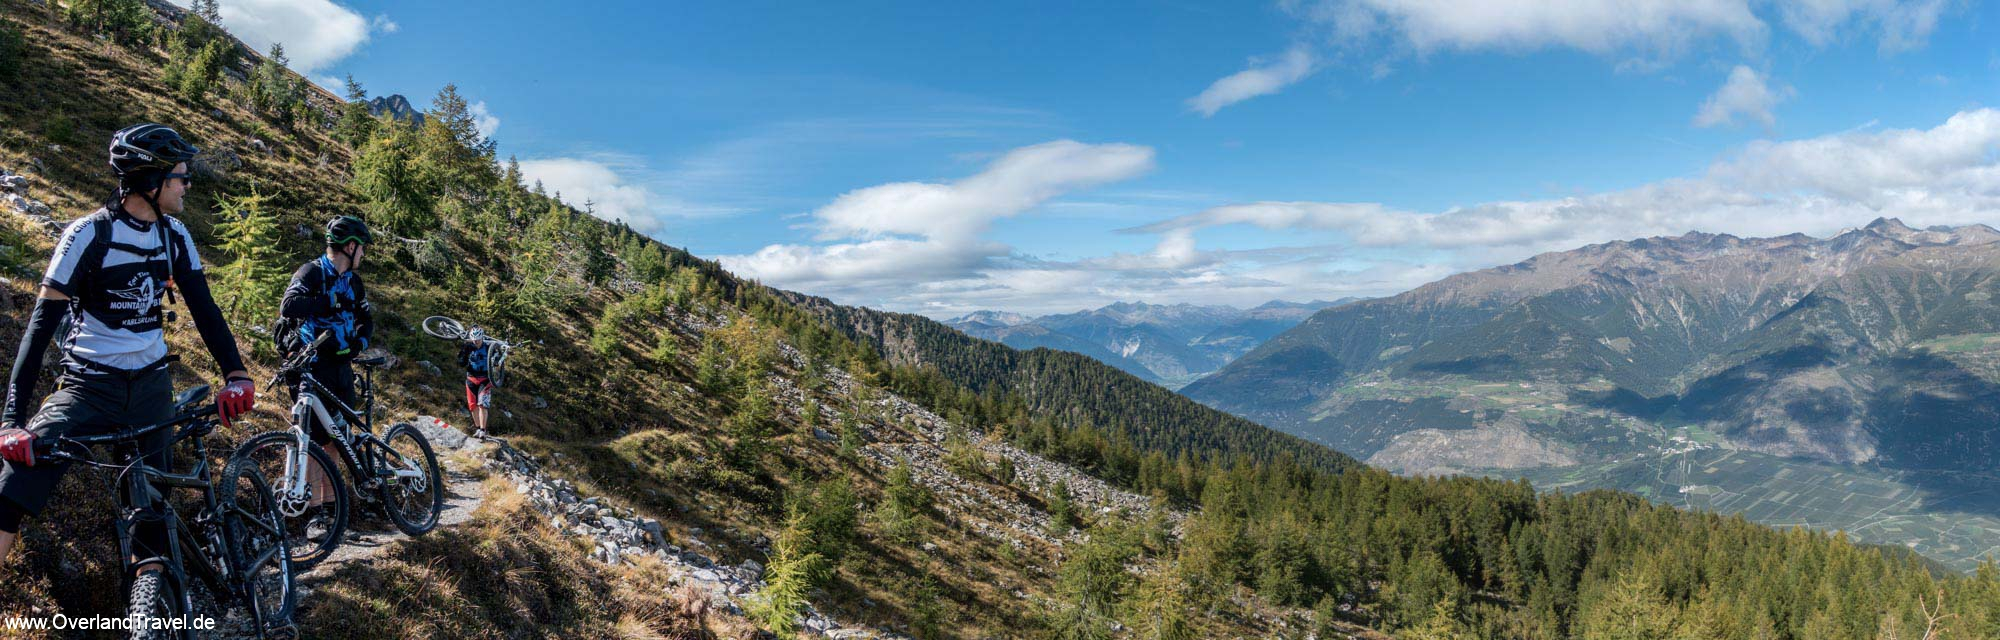 Tyrol Vinschgau mtb Tour Göflan Marmor Panorama